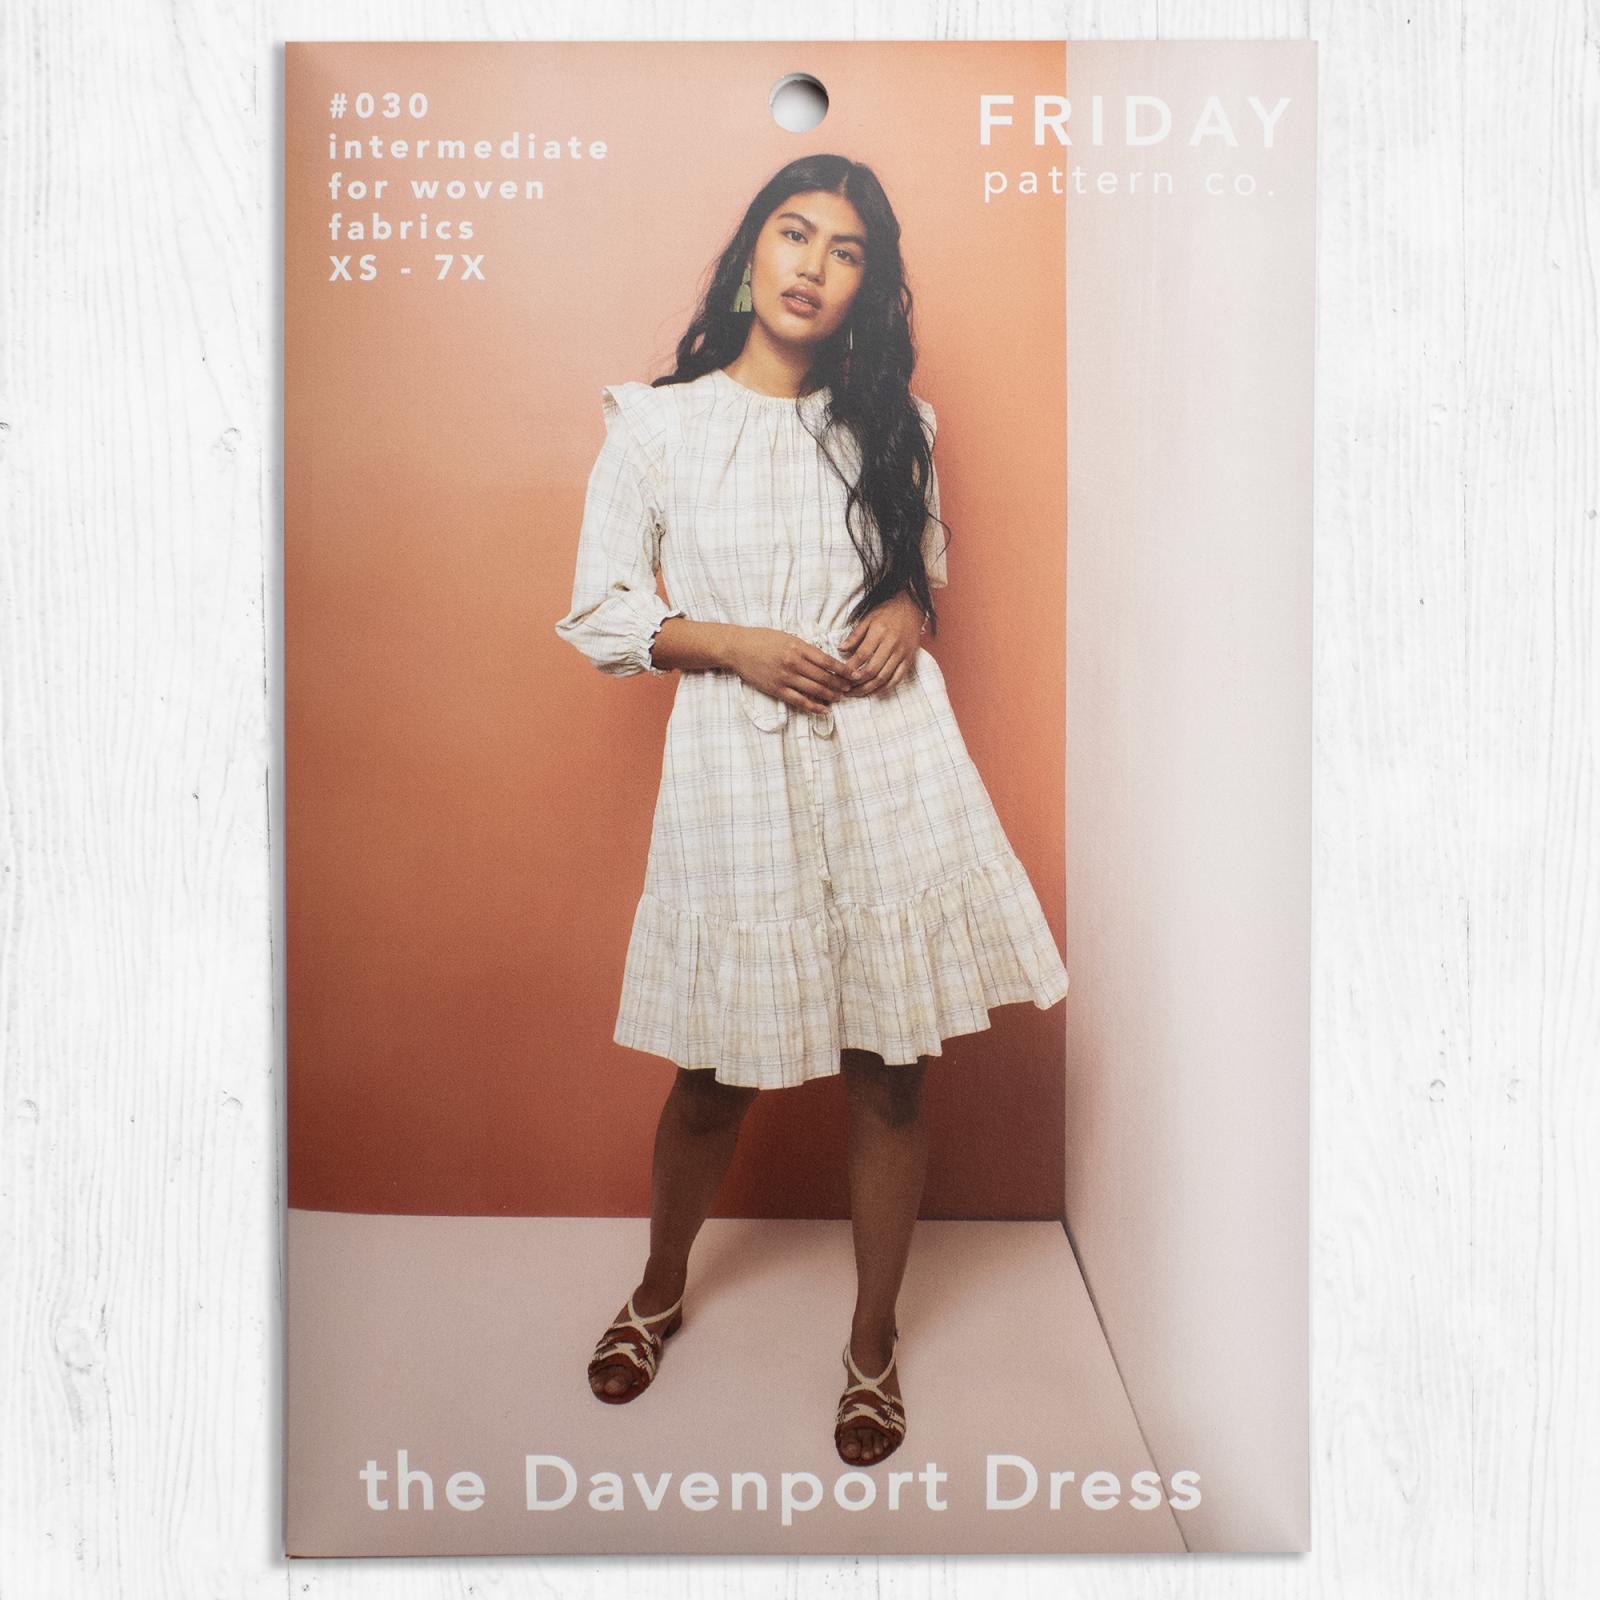 Friday Pattern Co - Davenport Dress